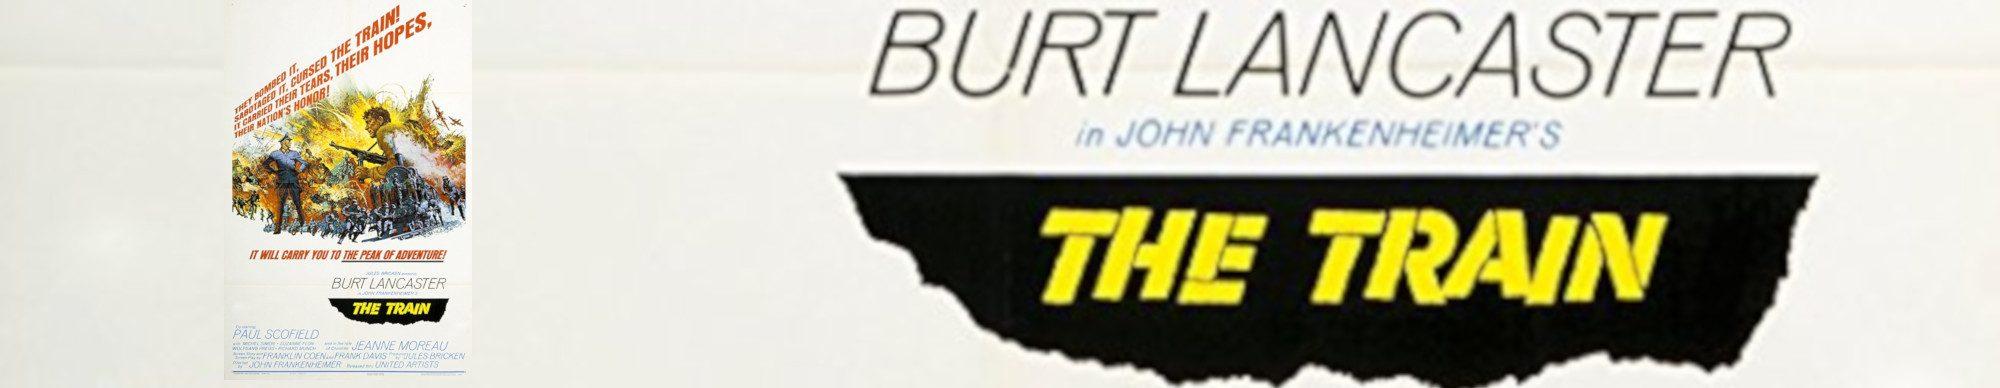 The Train Banner